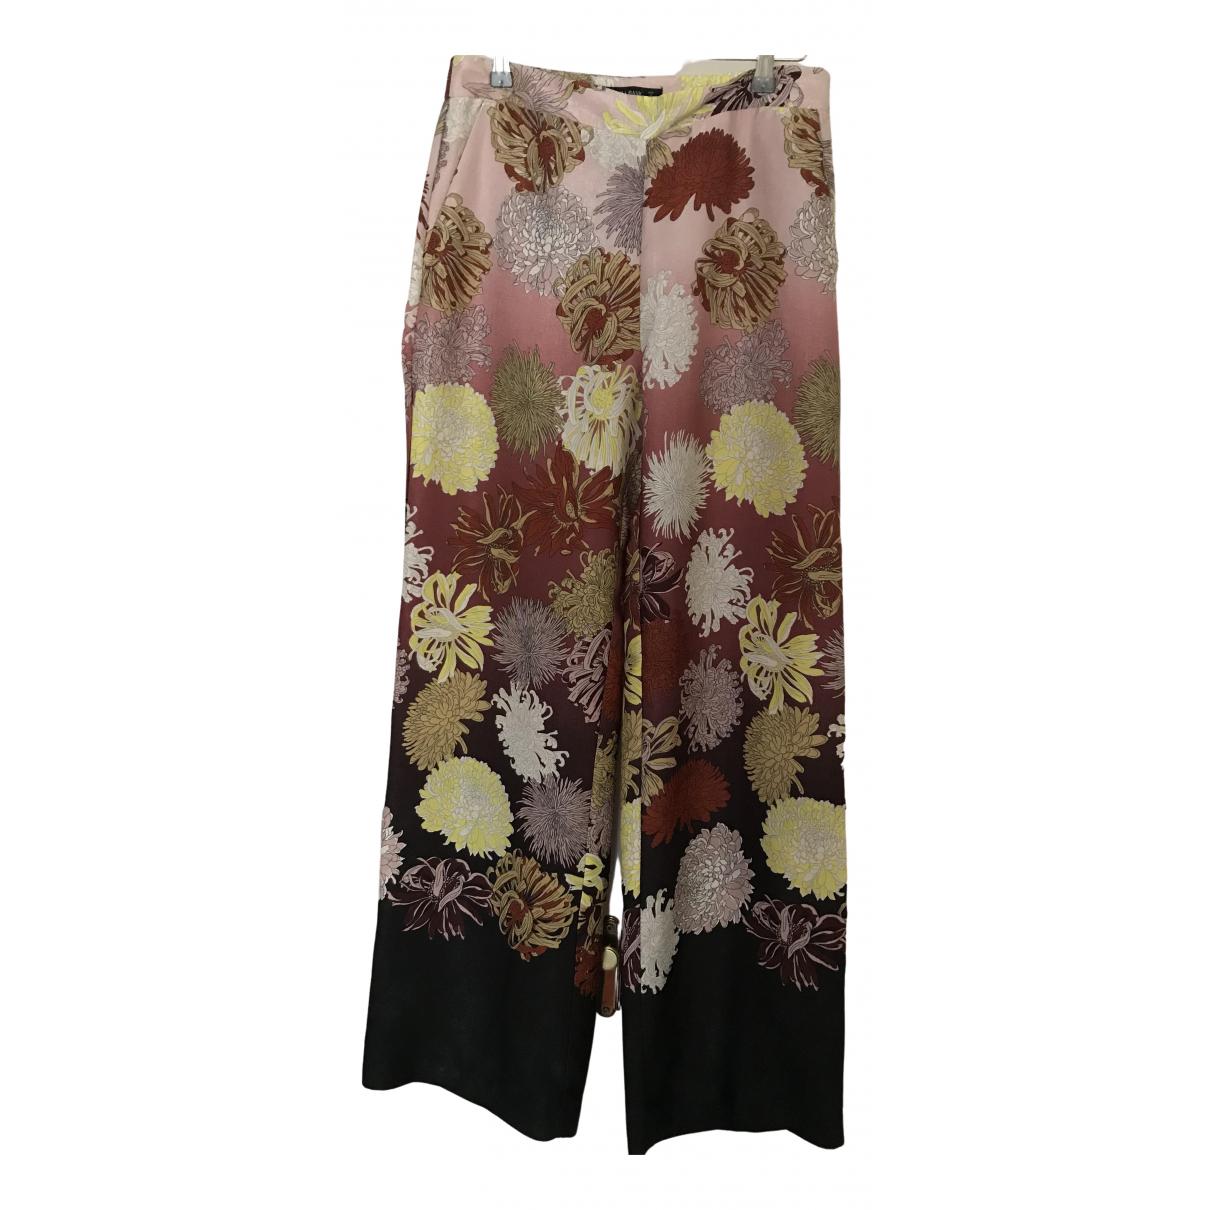 Zara \N Multicolour Trousers for Women M International